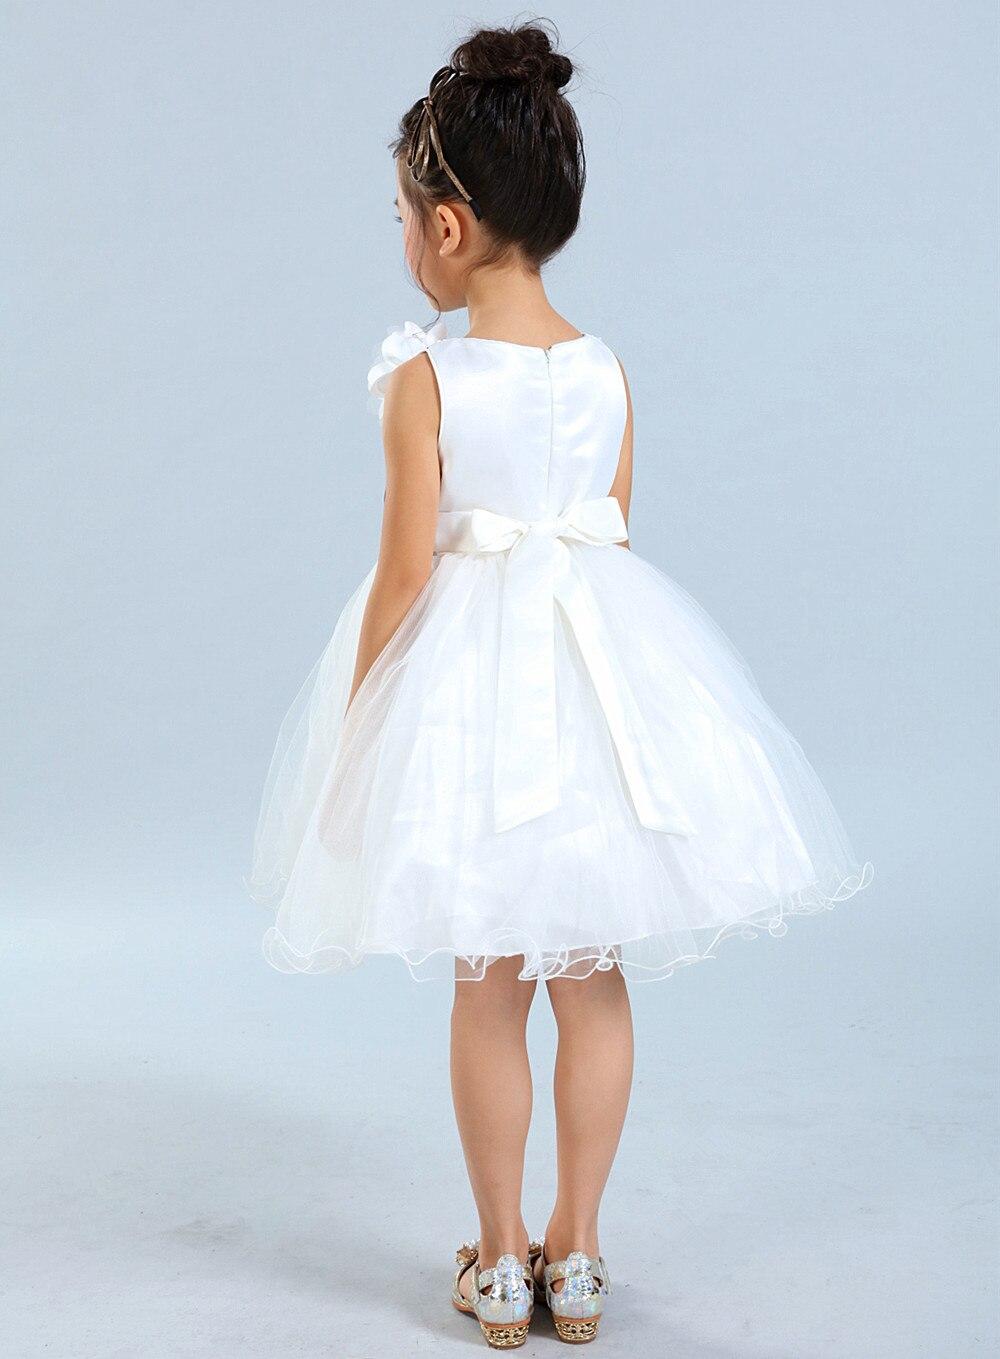 Cute Black And White Flower Girls Dresses Organza Ruffles Bow Kid